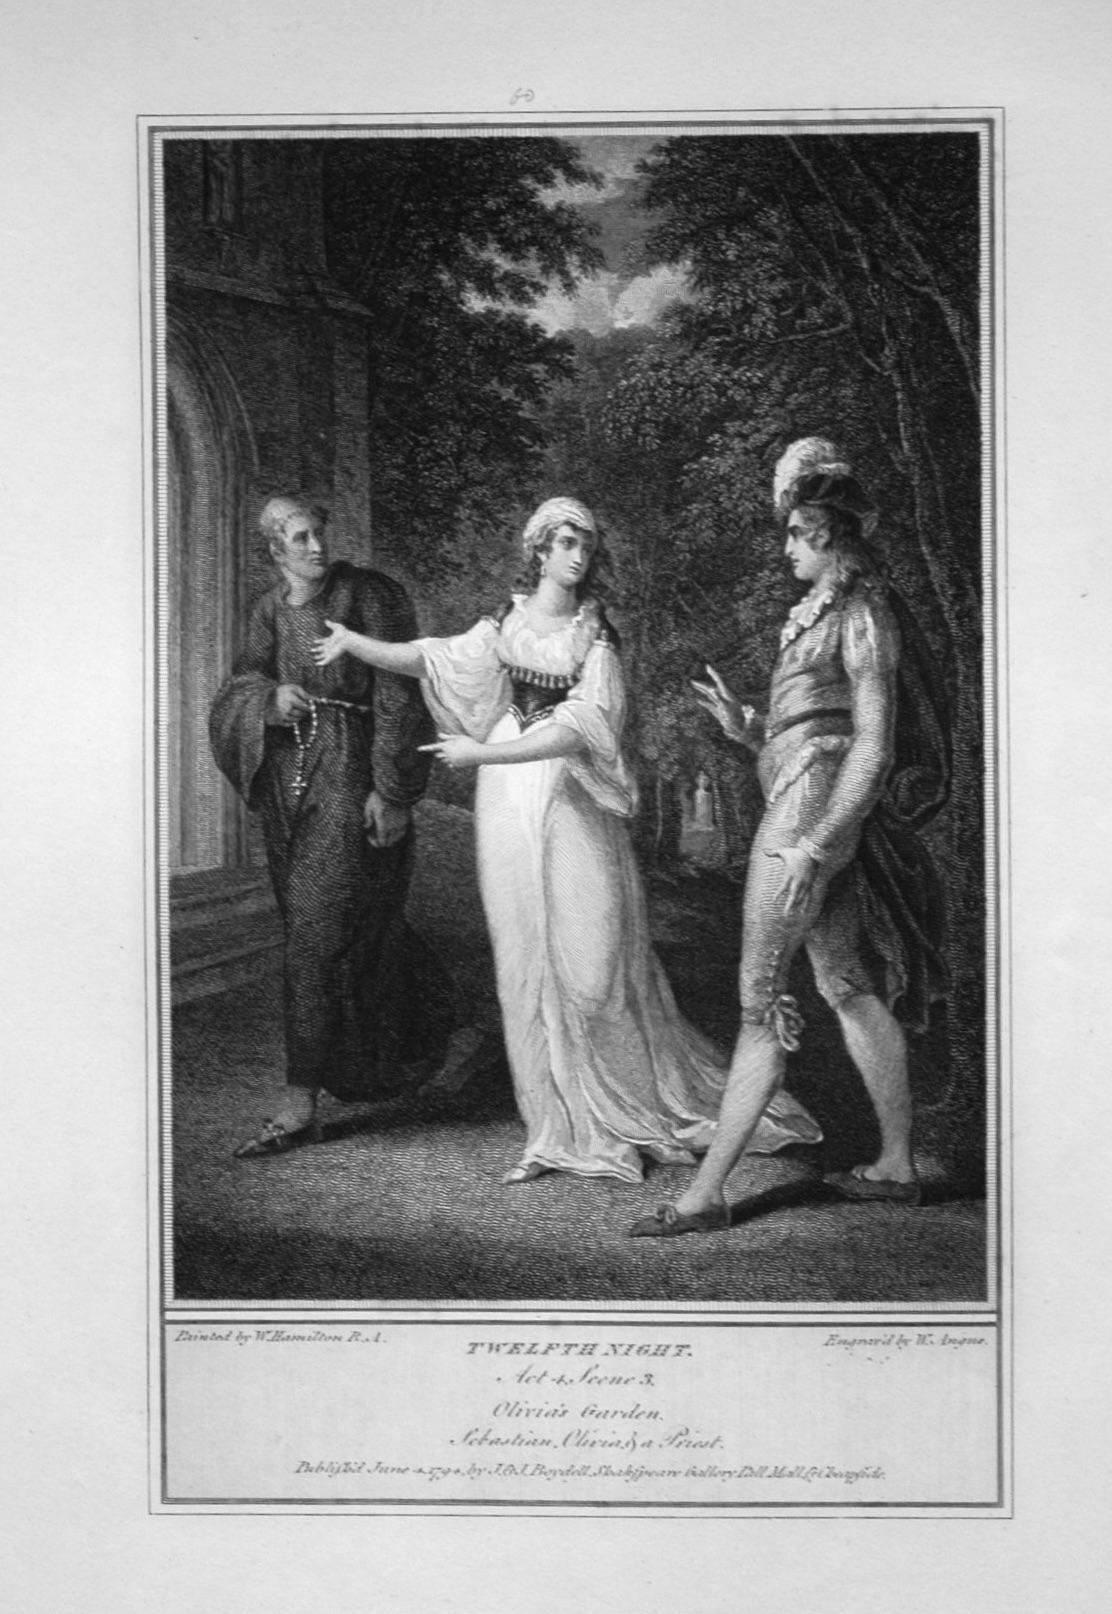 Twelfth Night. Act 4. Scene 3.